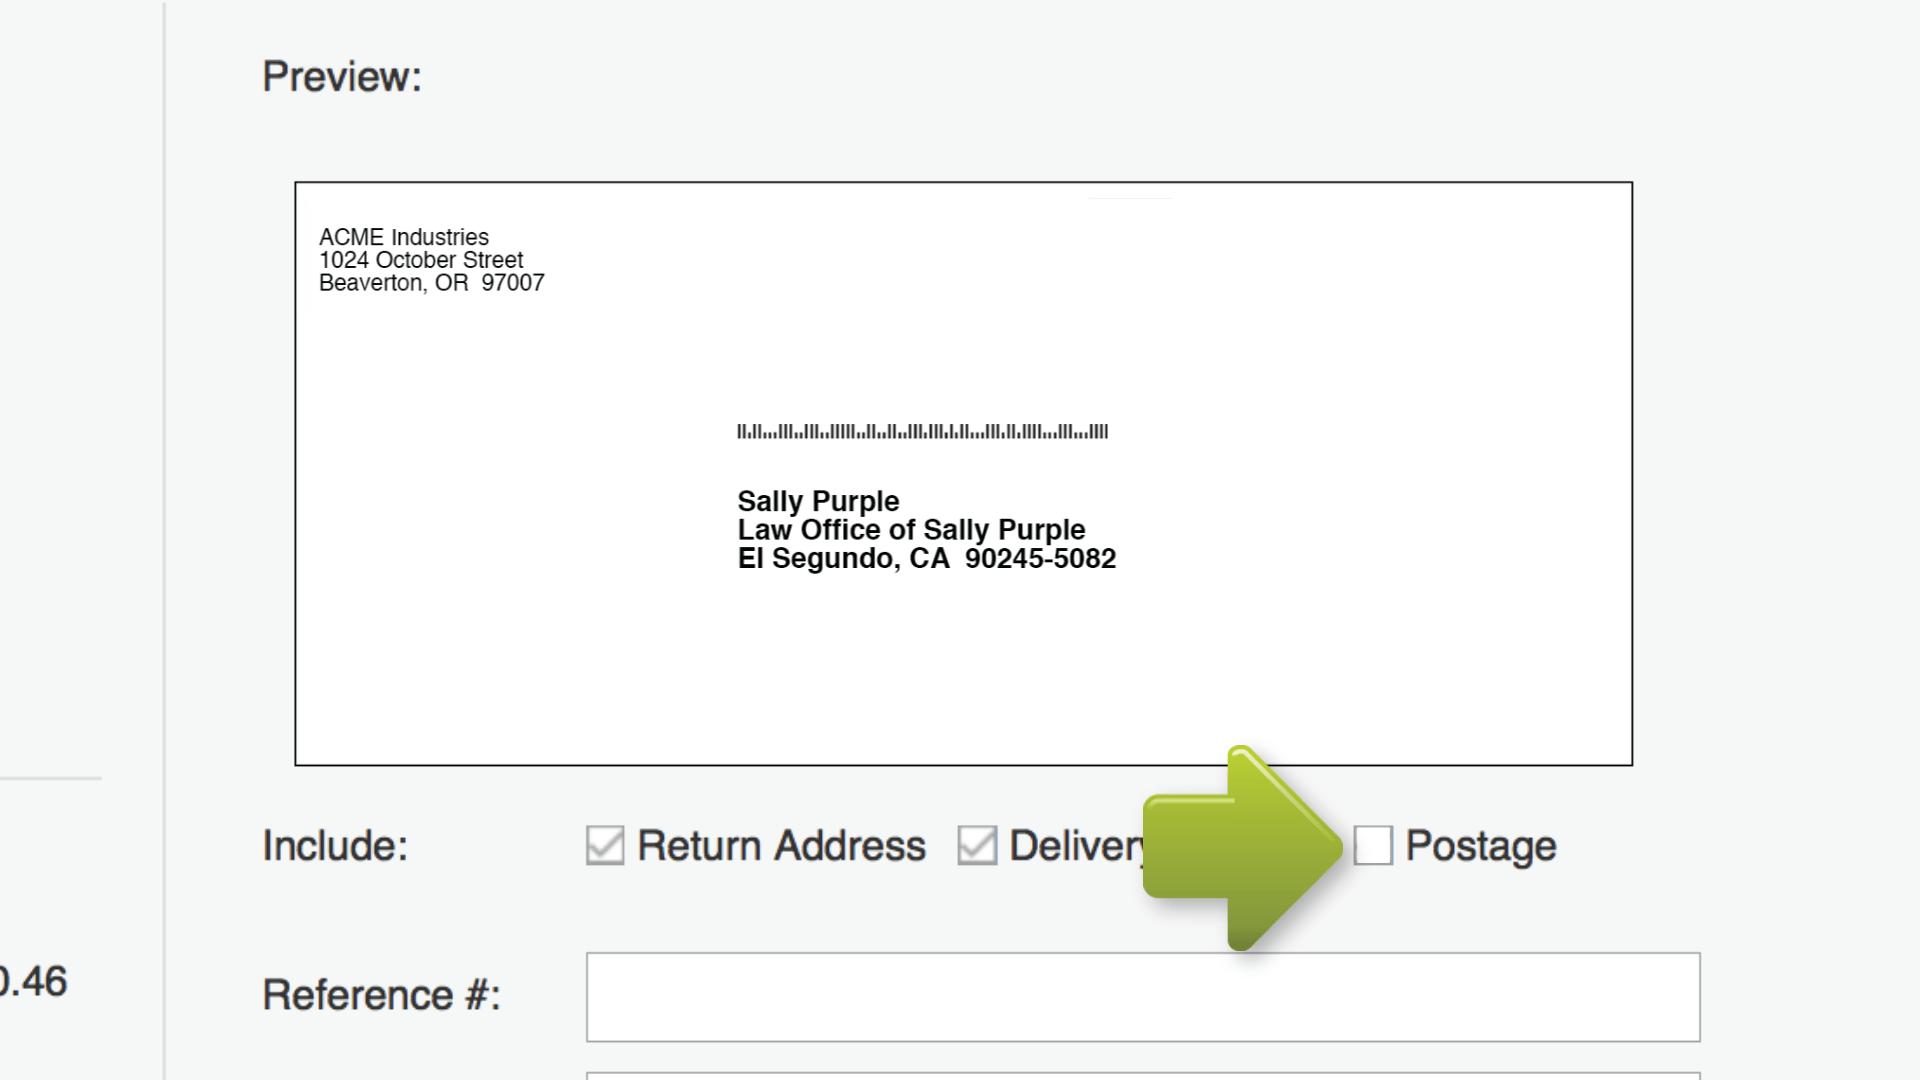 how to print envelopes